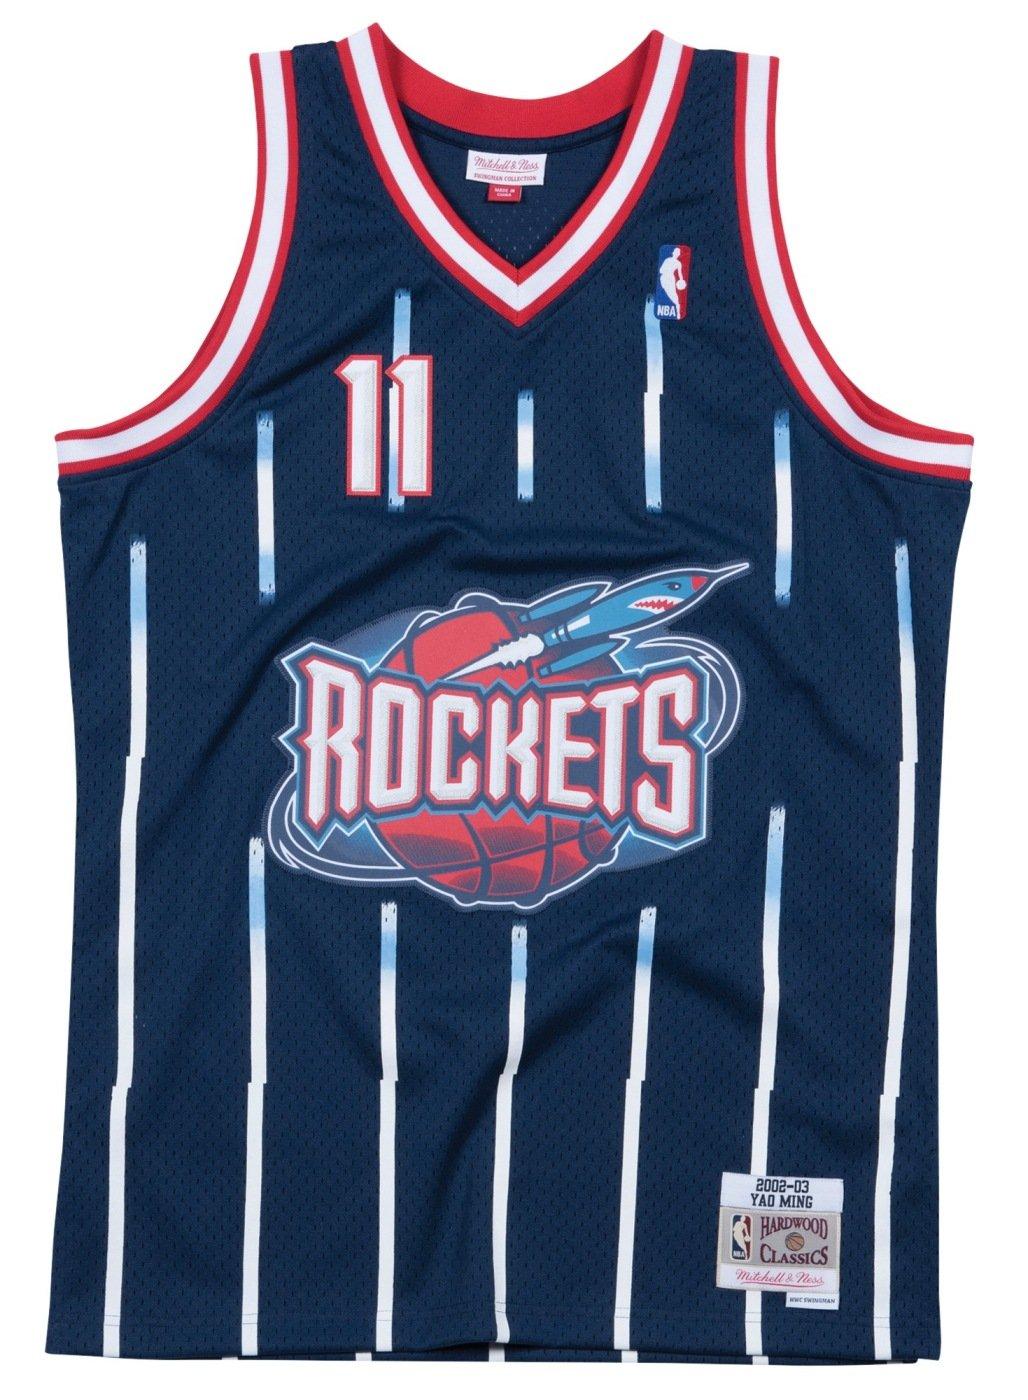 separation shoes 59165 4111c Amazon.com : Yao Ming Houston Rockets Mitchell and Ness ...